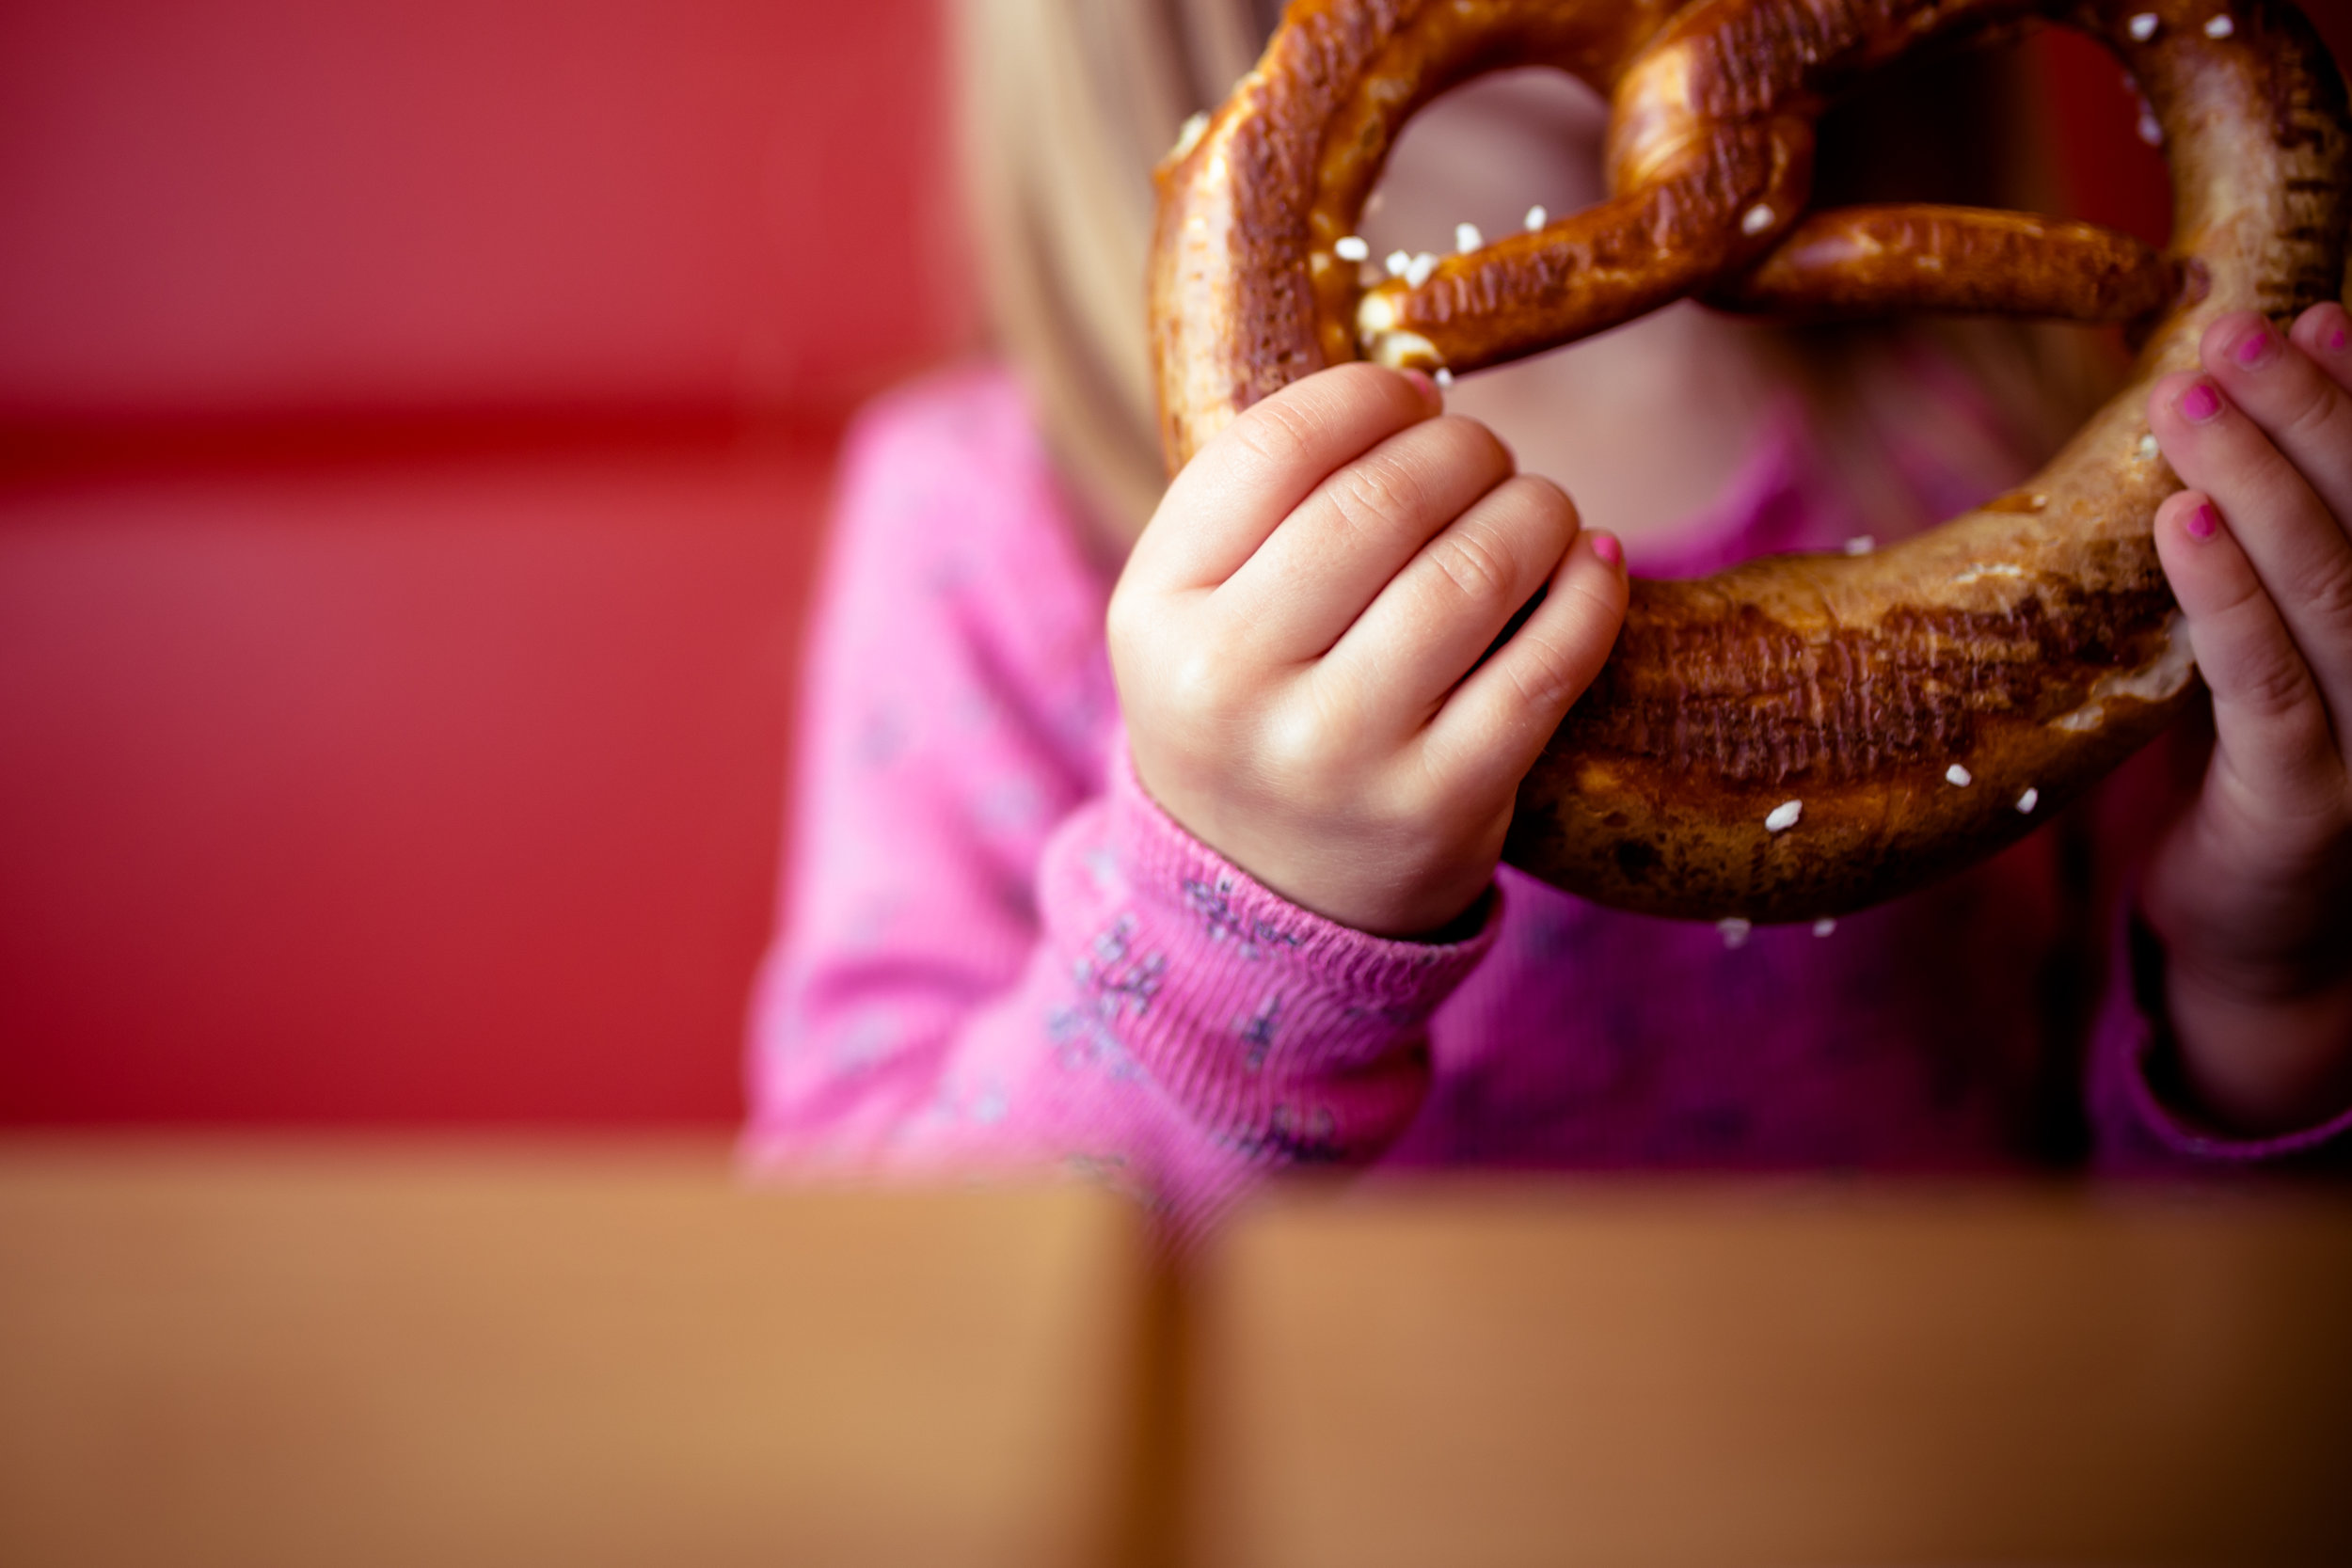 girl holds salted pretzel at bakery table